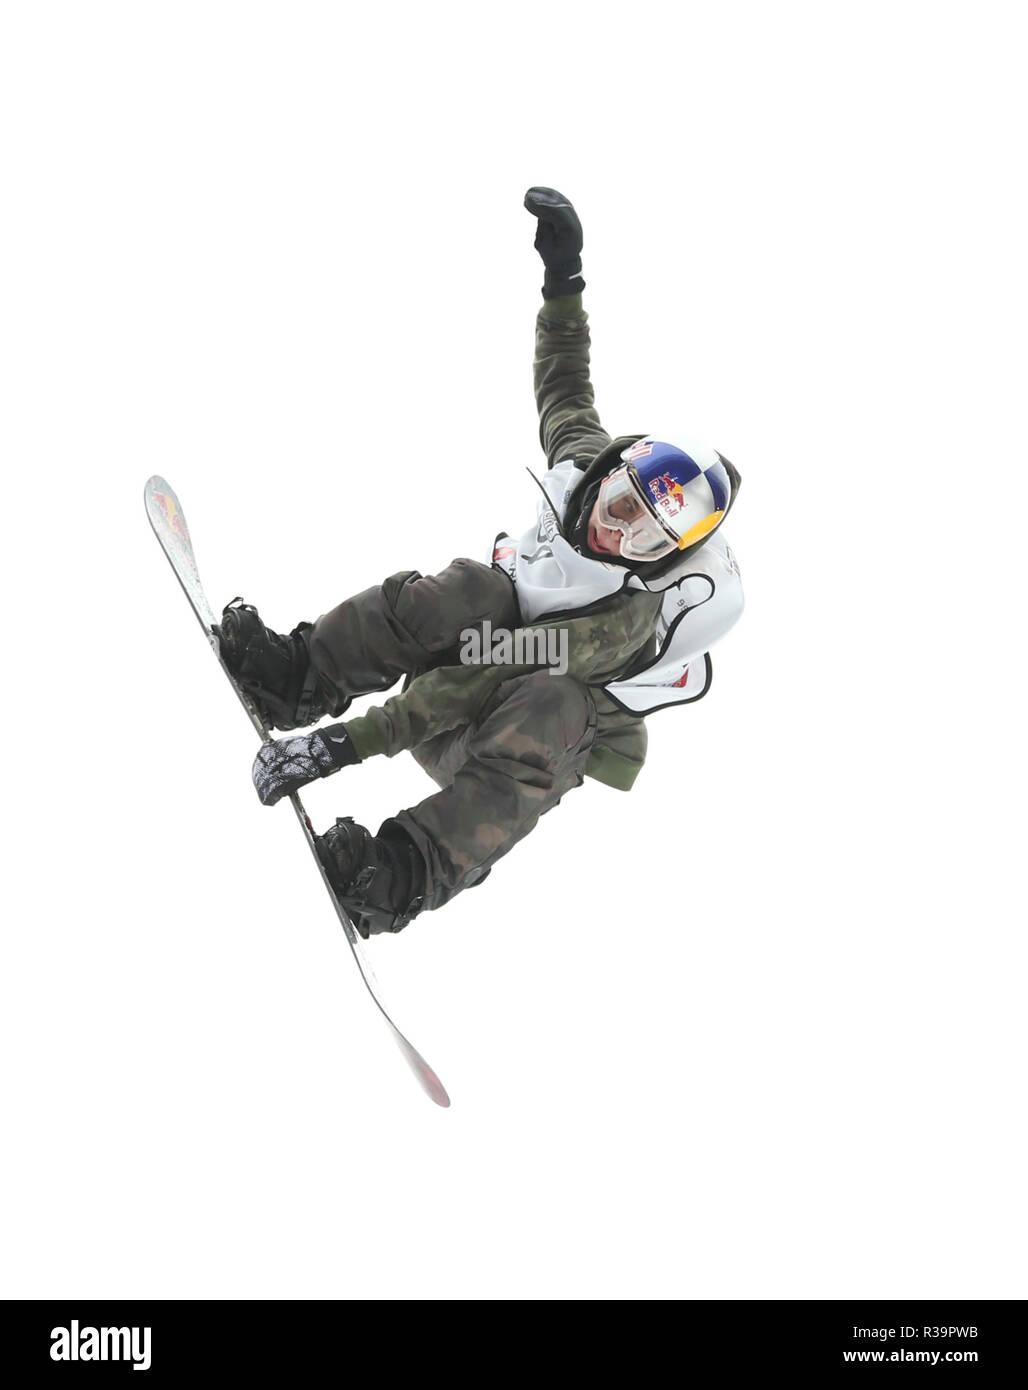 Beijing, China. 23 Nov, 2018. Marcus Kleveland de Noruega compite durante el hombre de Snowboard Big Air calor calificación 1 en el 2018 FIS de Big Air World Cup en Beijing, capital de China, Noviembre 23, 2018. Crédito: Jia Haocheng/Xinhua/Alamy Live News Imagen De Stock